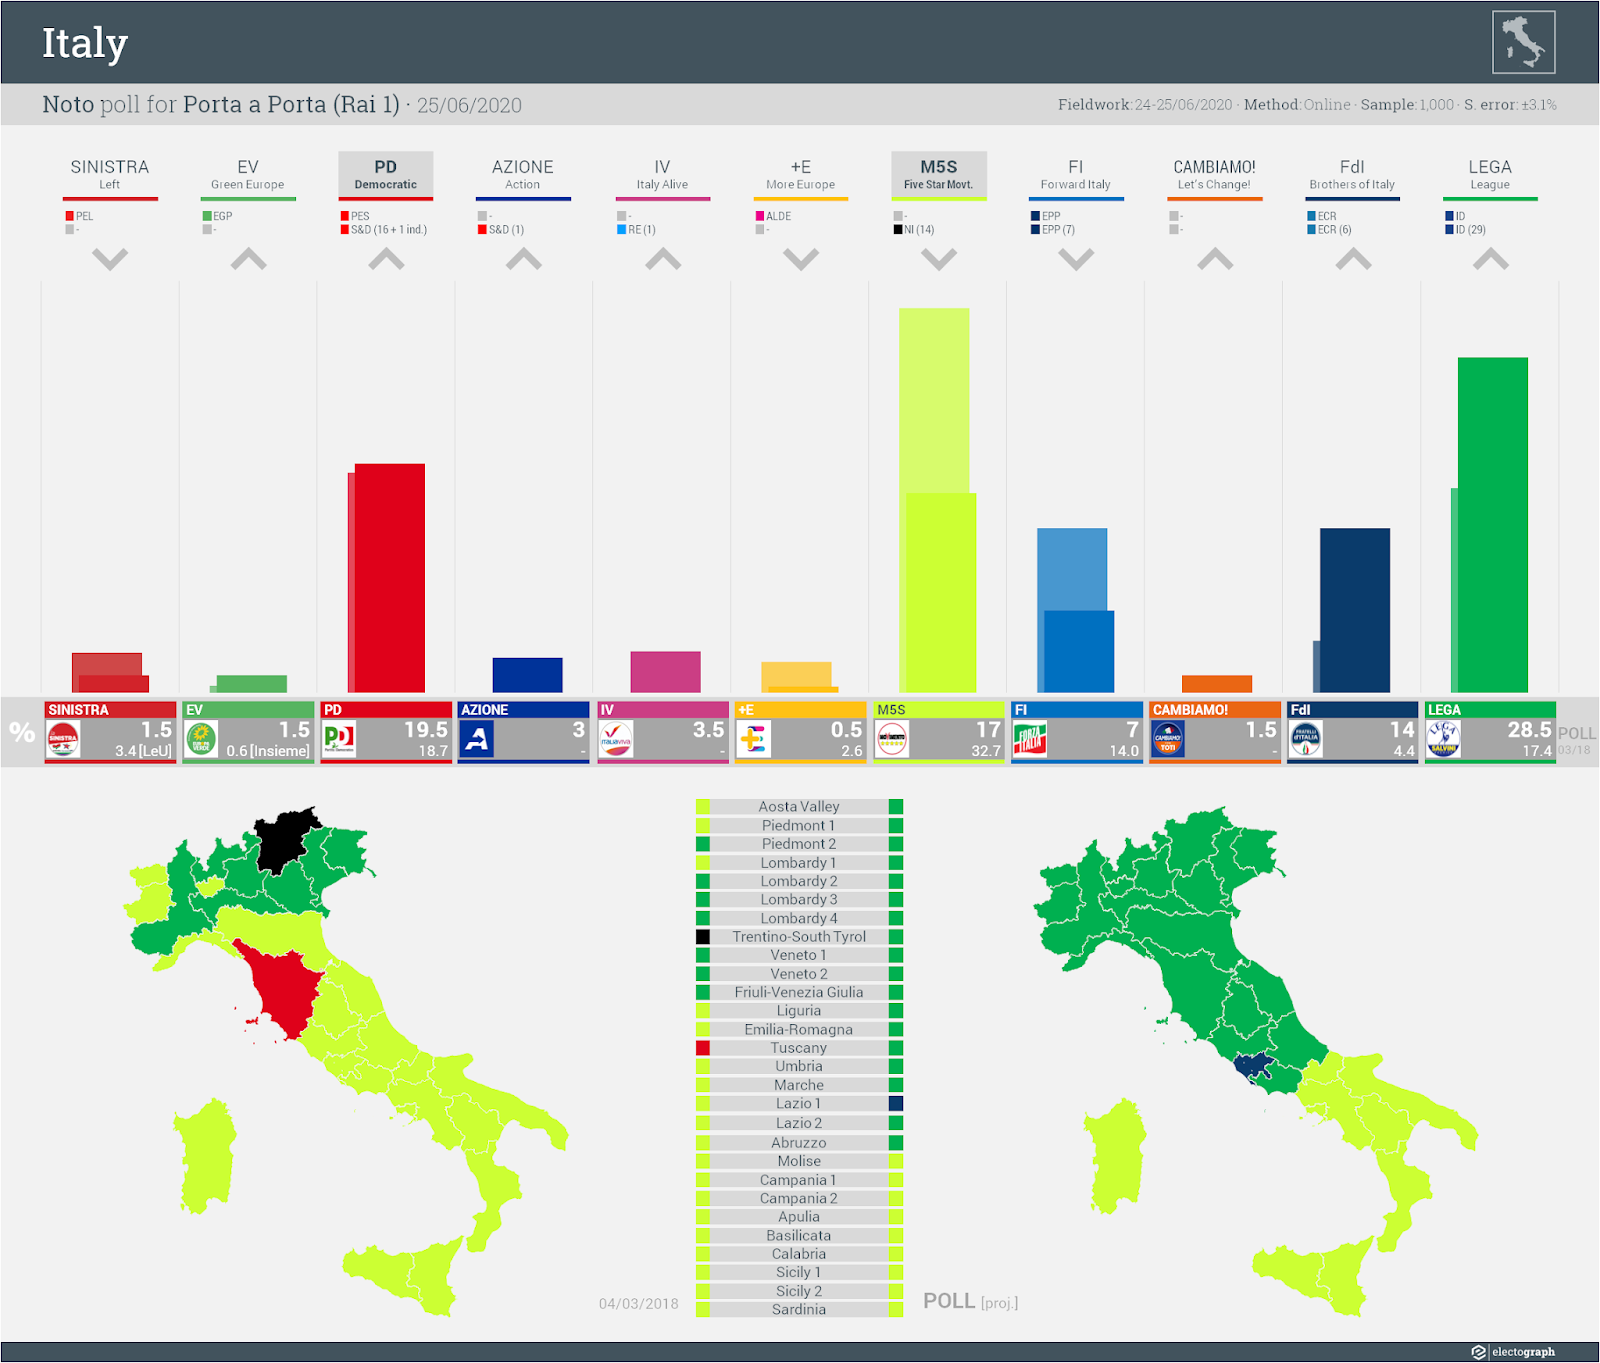 ITALY: Noto poll chart for Porta a Porta (Rai 1), 25 June 2020